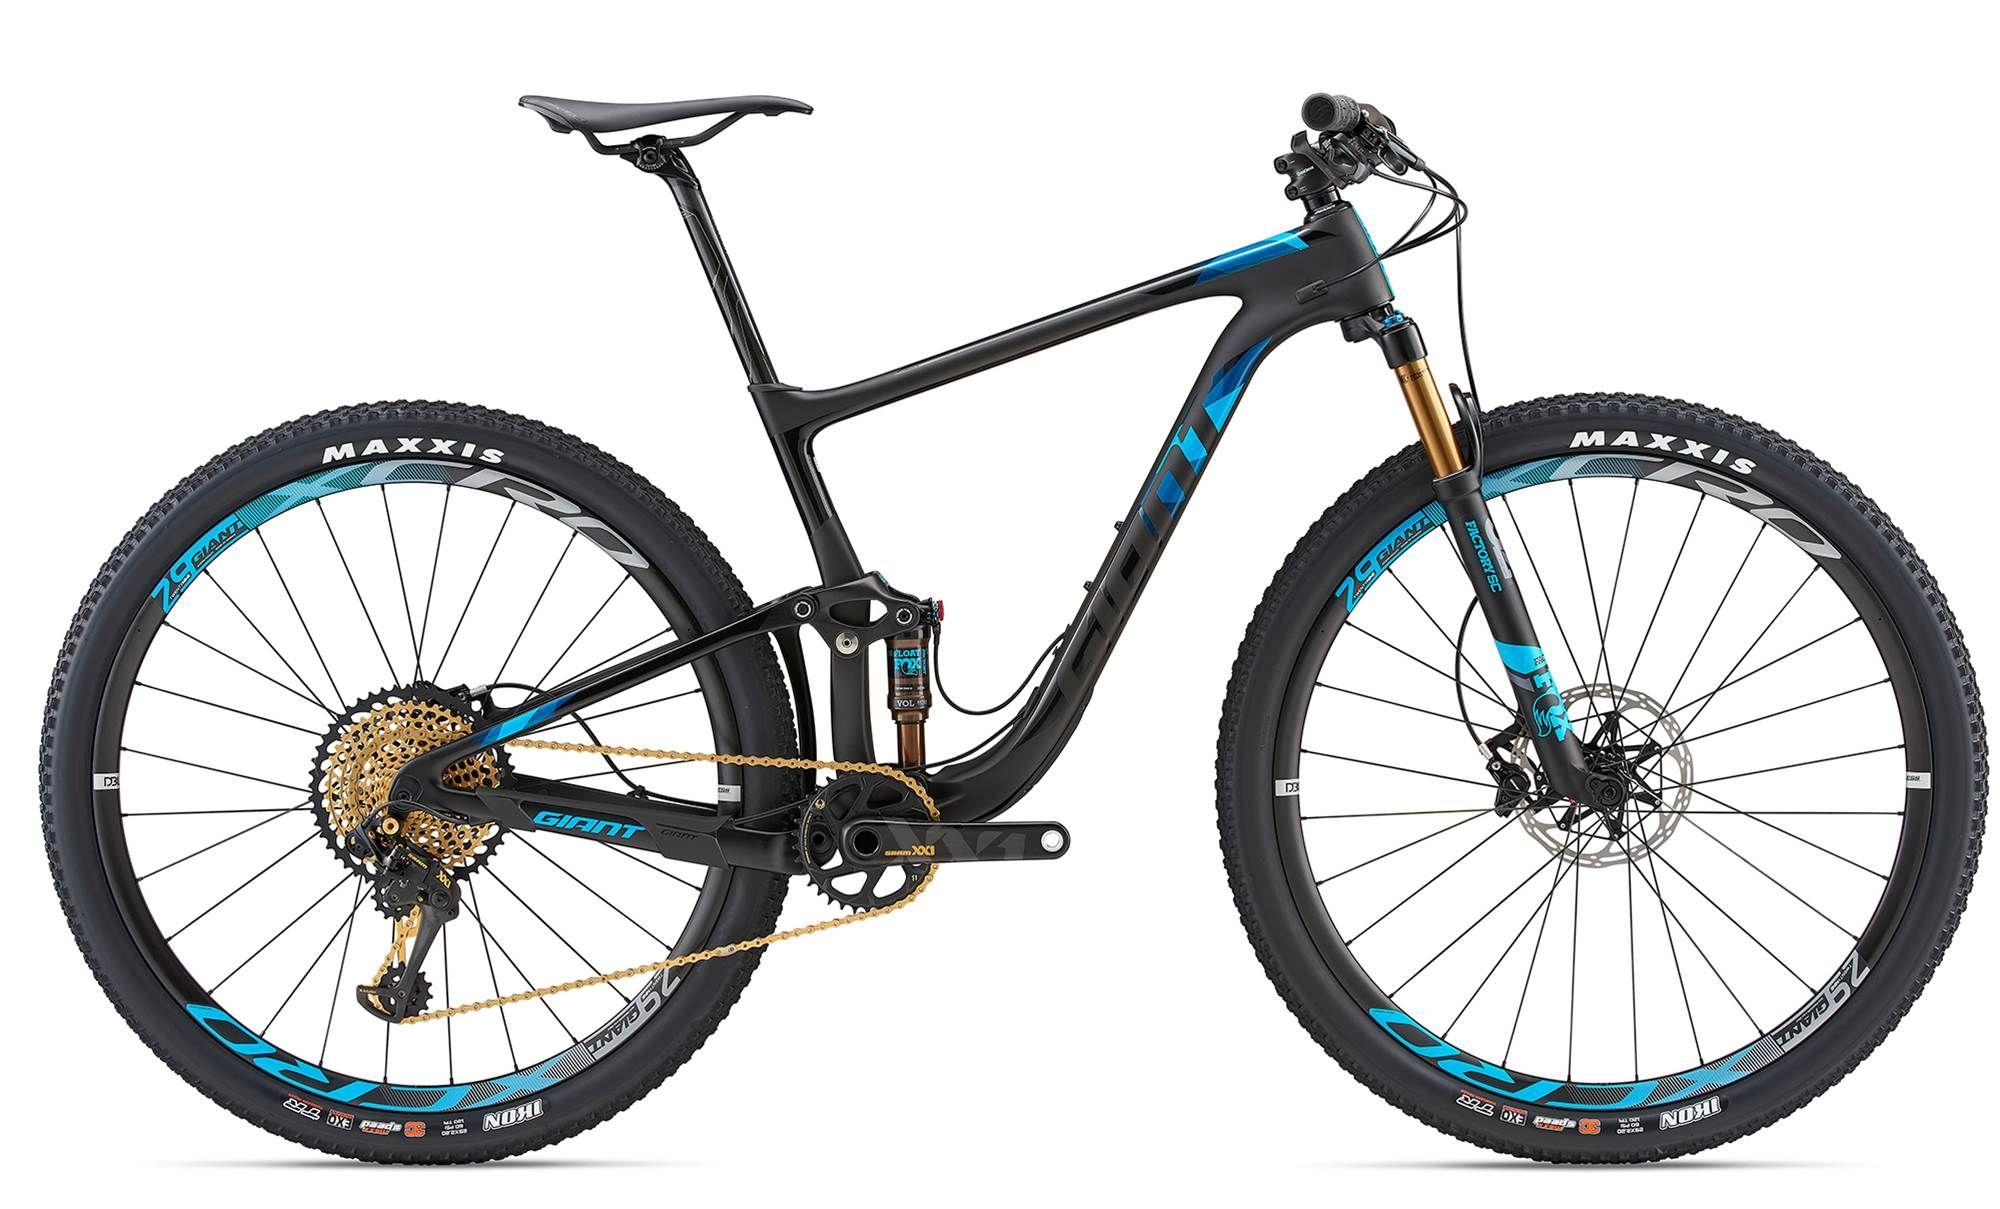 Giant S 2018 Mtb Range Is The Best Yet Australian Mountain Bike